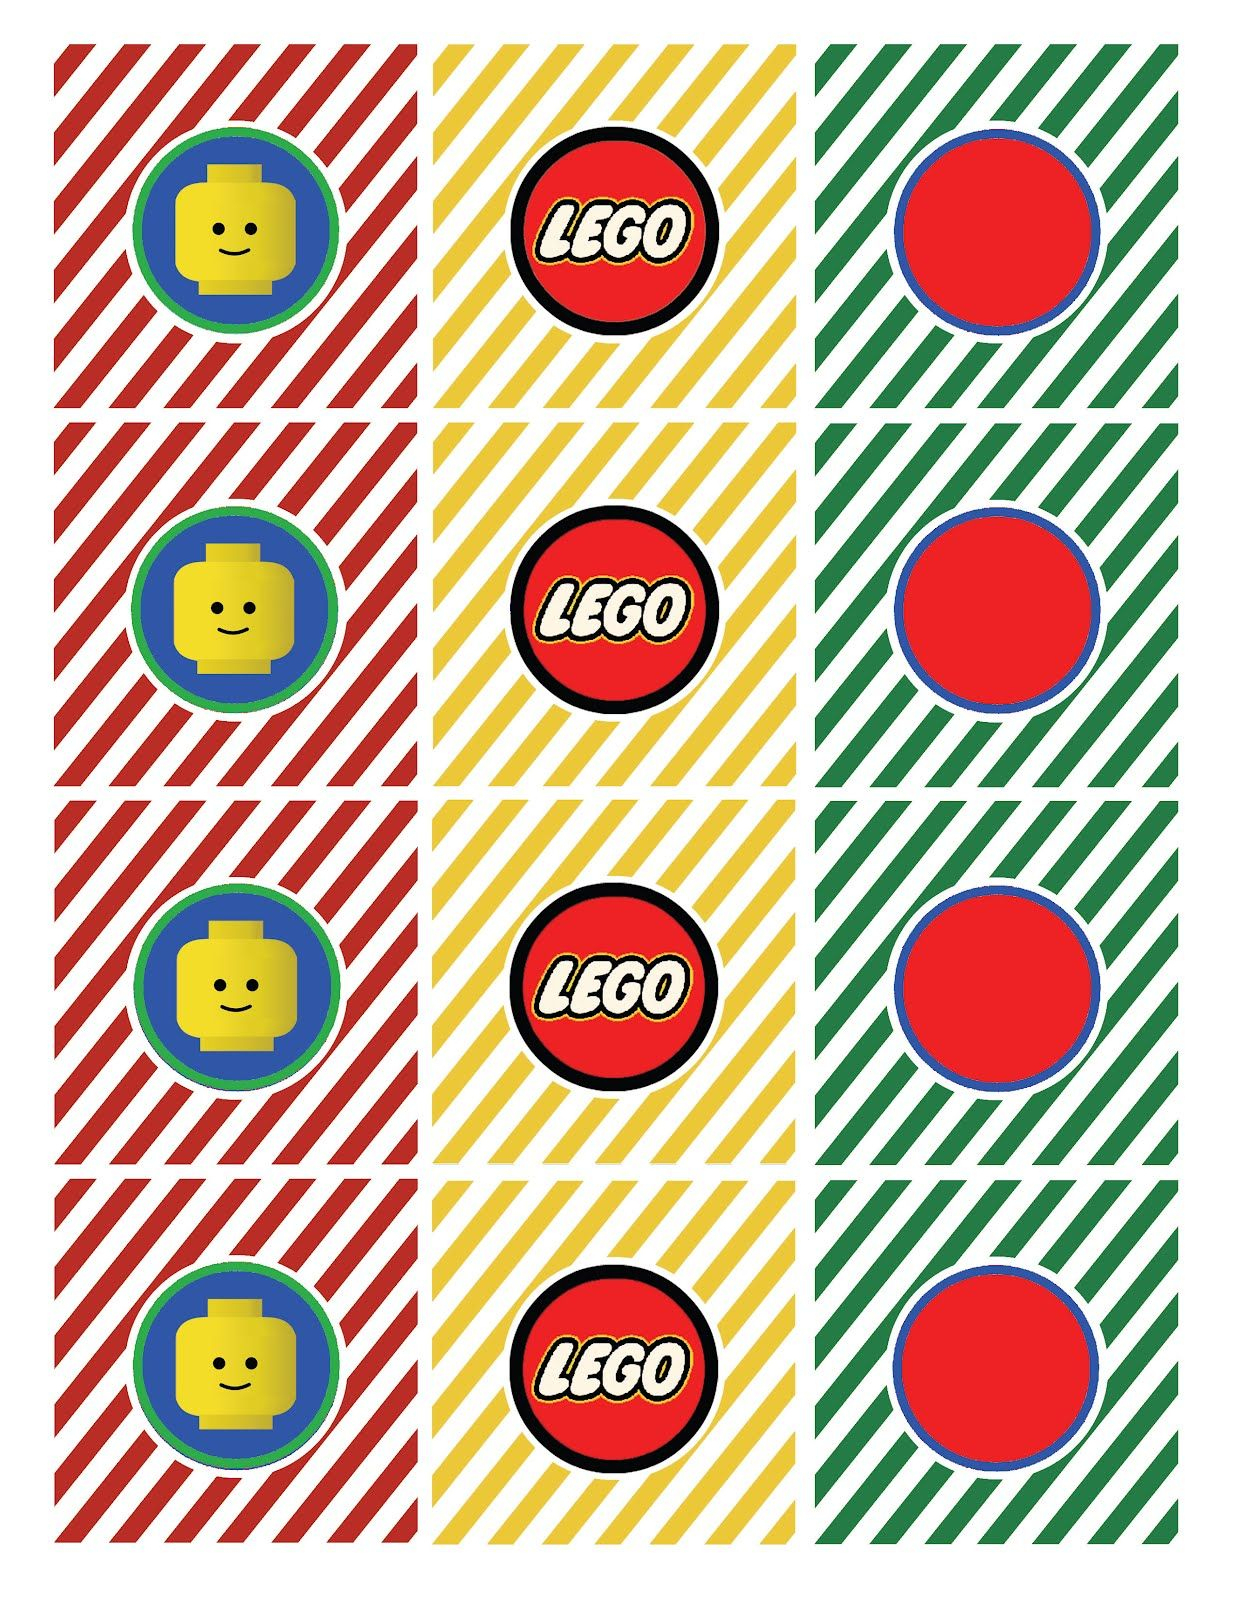 Free Lego Printables | Lego Straw Flag Says Drink Me Lego Tented - Free Printable Lego Cupcake Toppers